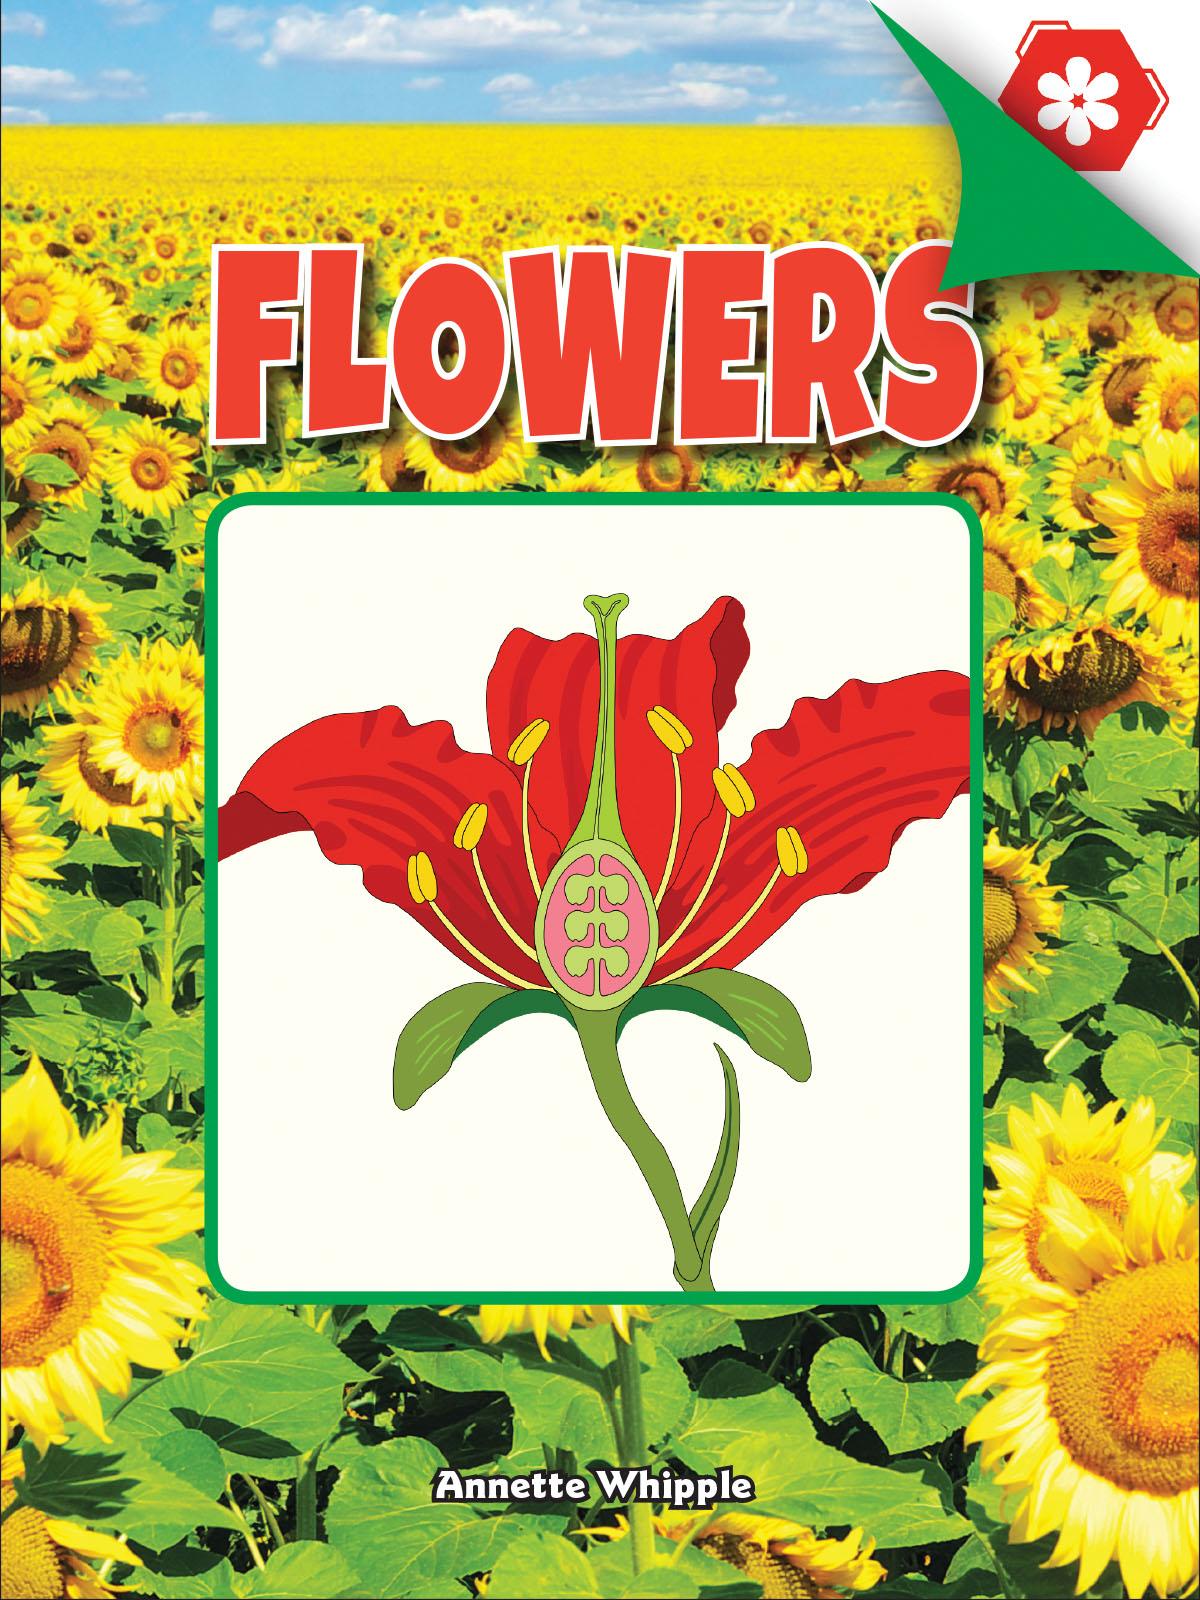 Cover for Annette Whipple's book Flowers